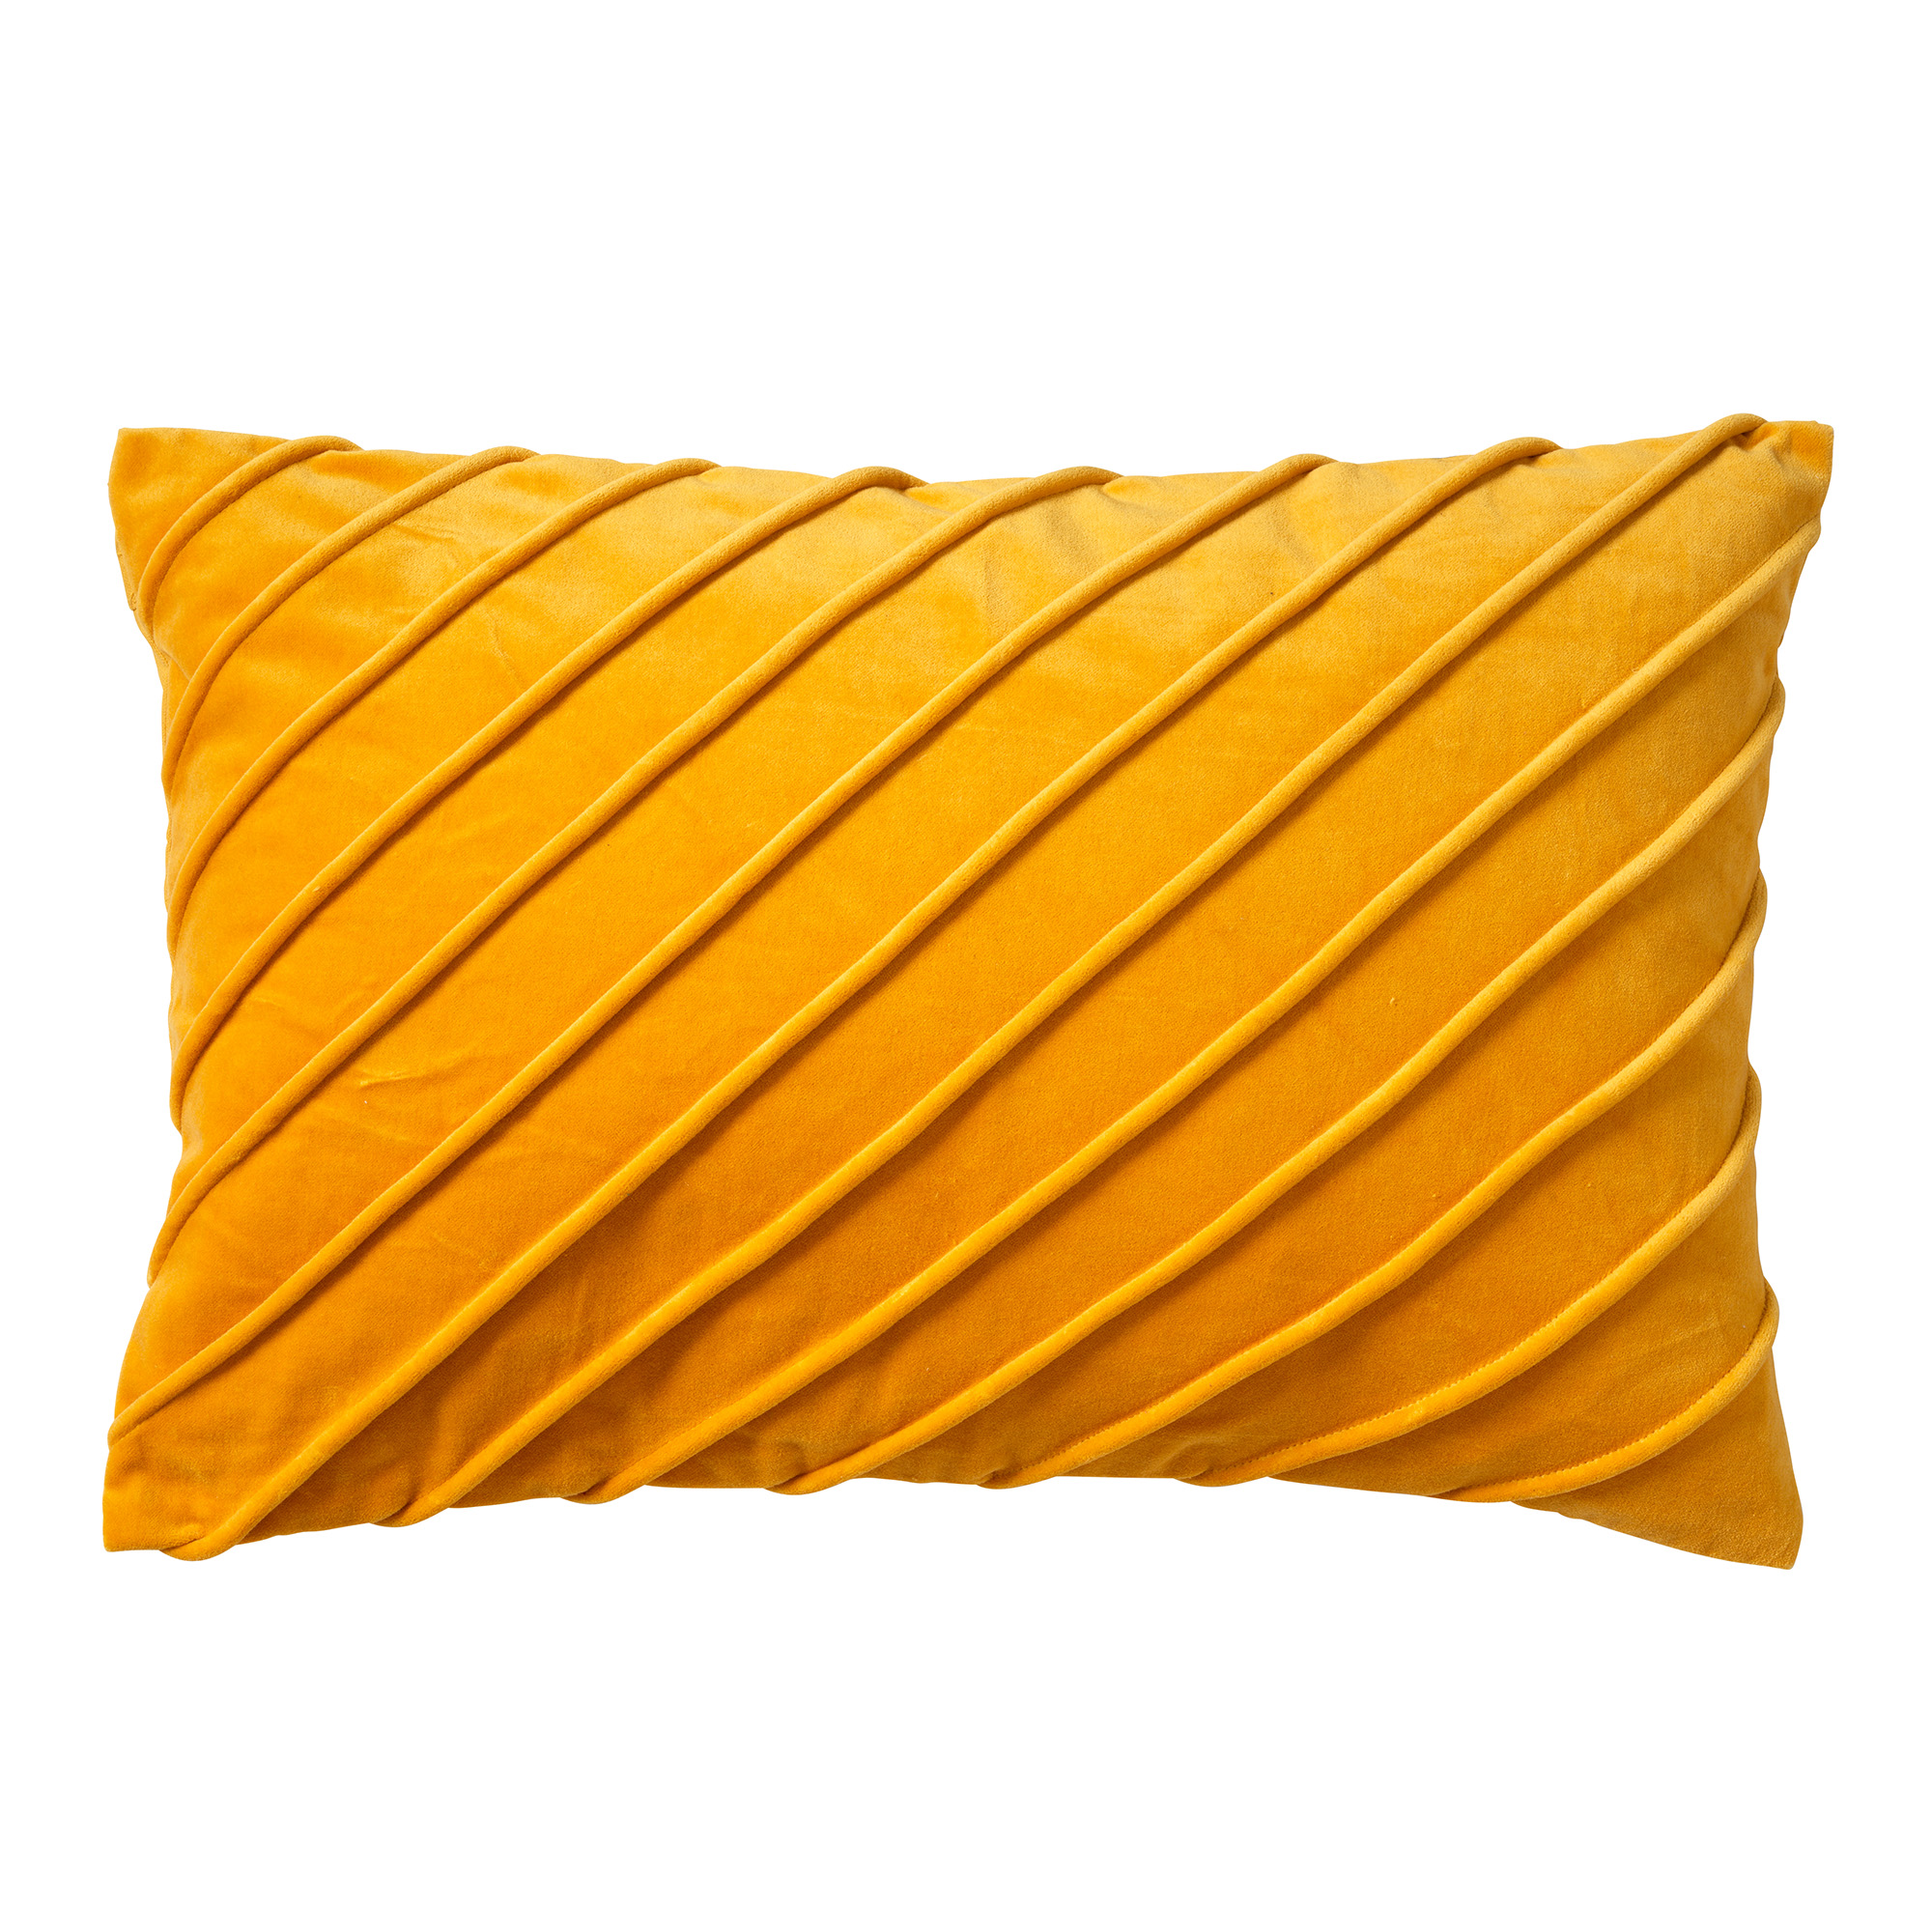 PACO - Sierkussen velvet 40x60 cm Golden Glow